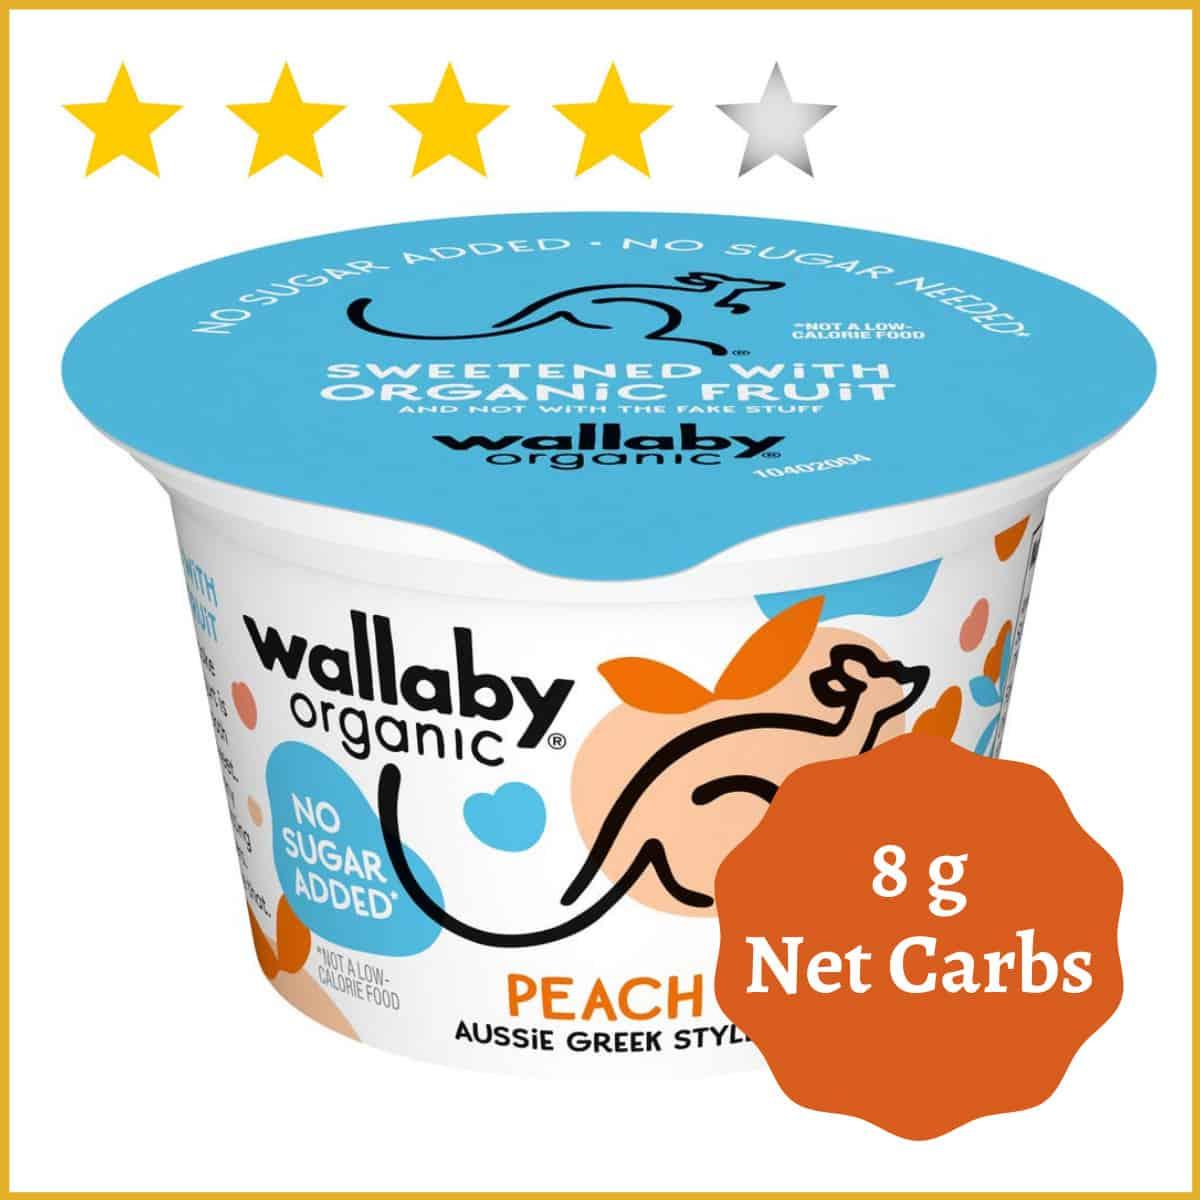 Wallaby, Yogurt Aussie Greek Hibiscus Peach Organic